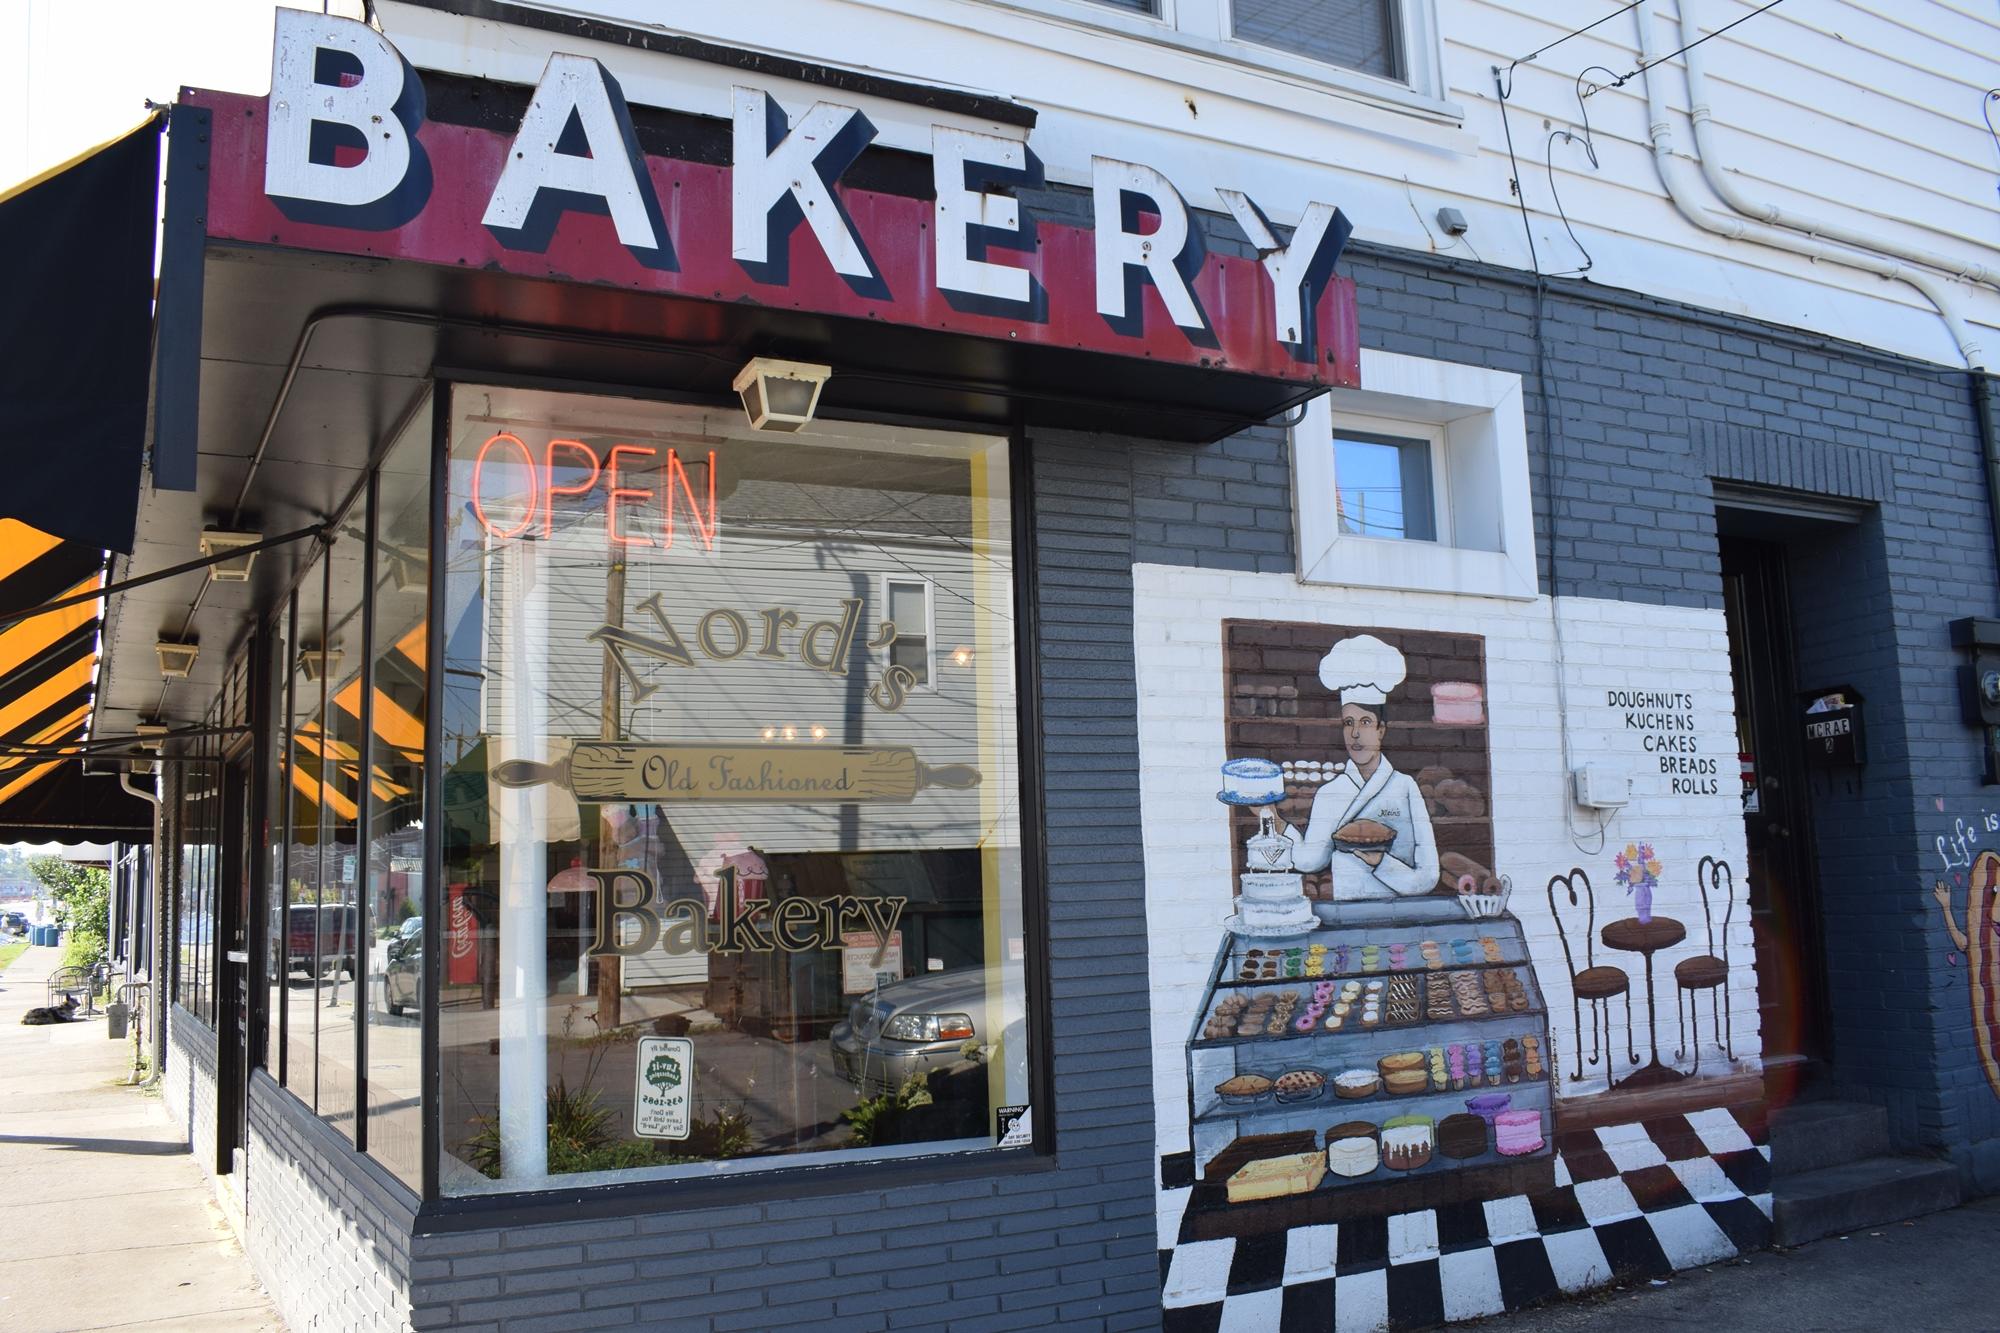 Louisville Chef Ky Bakery